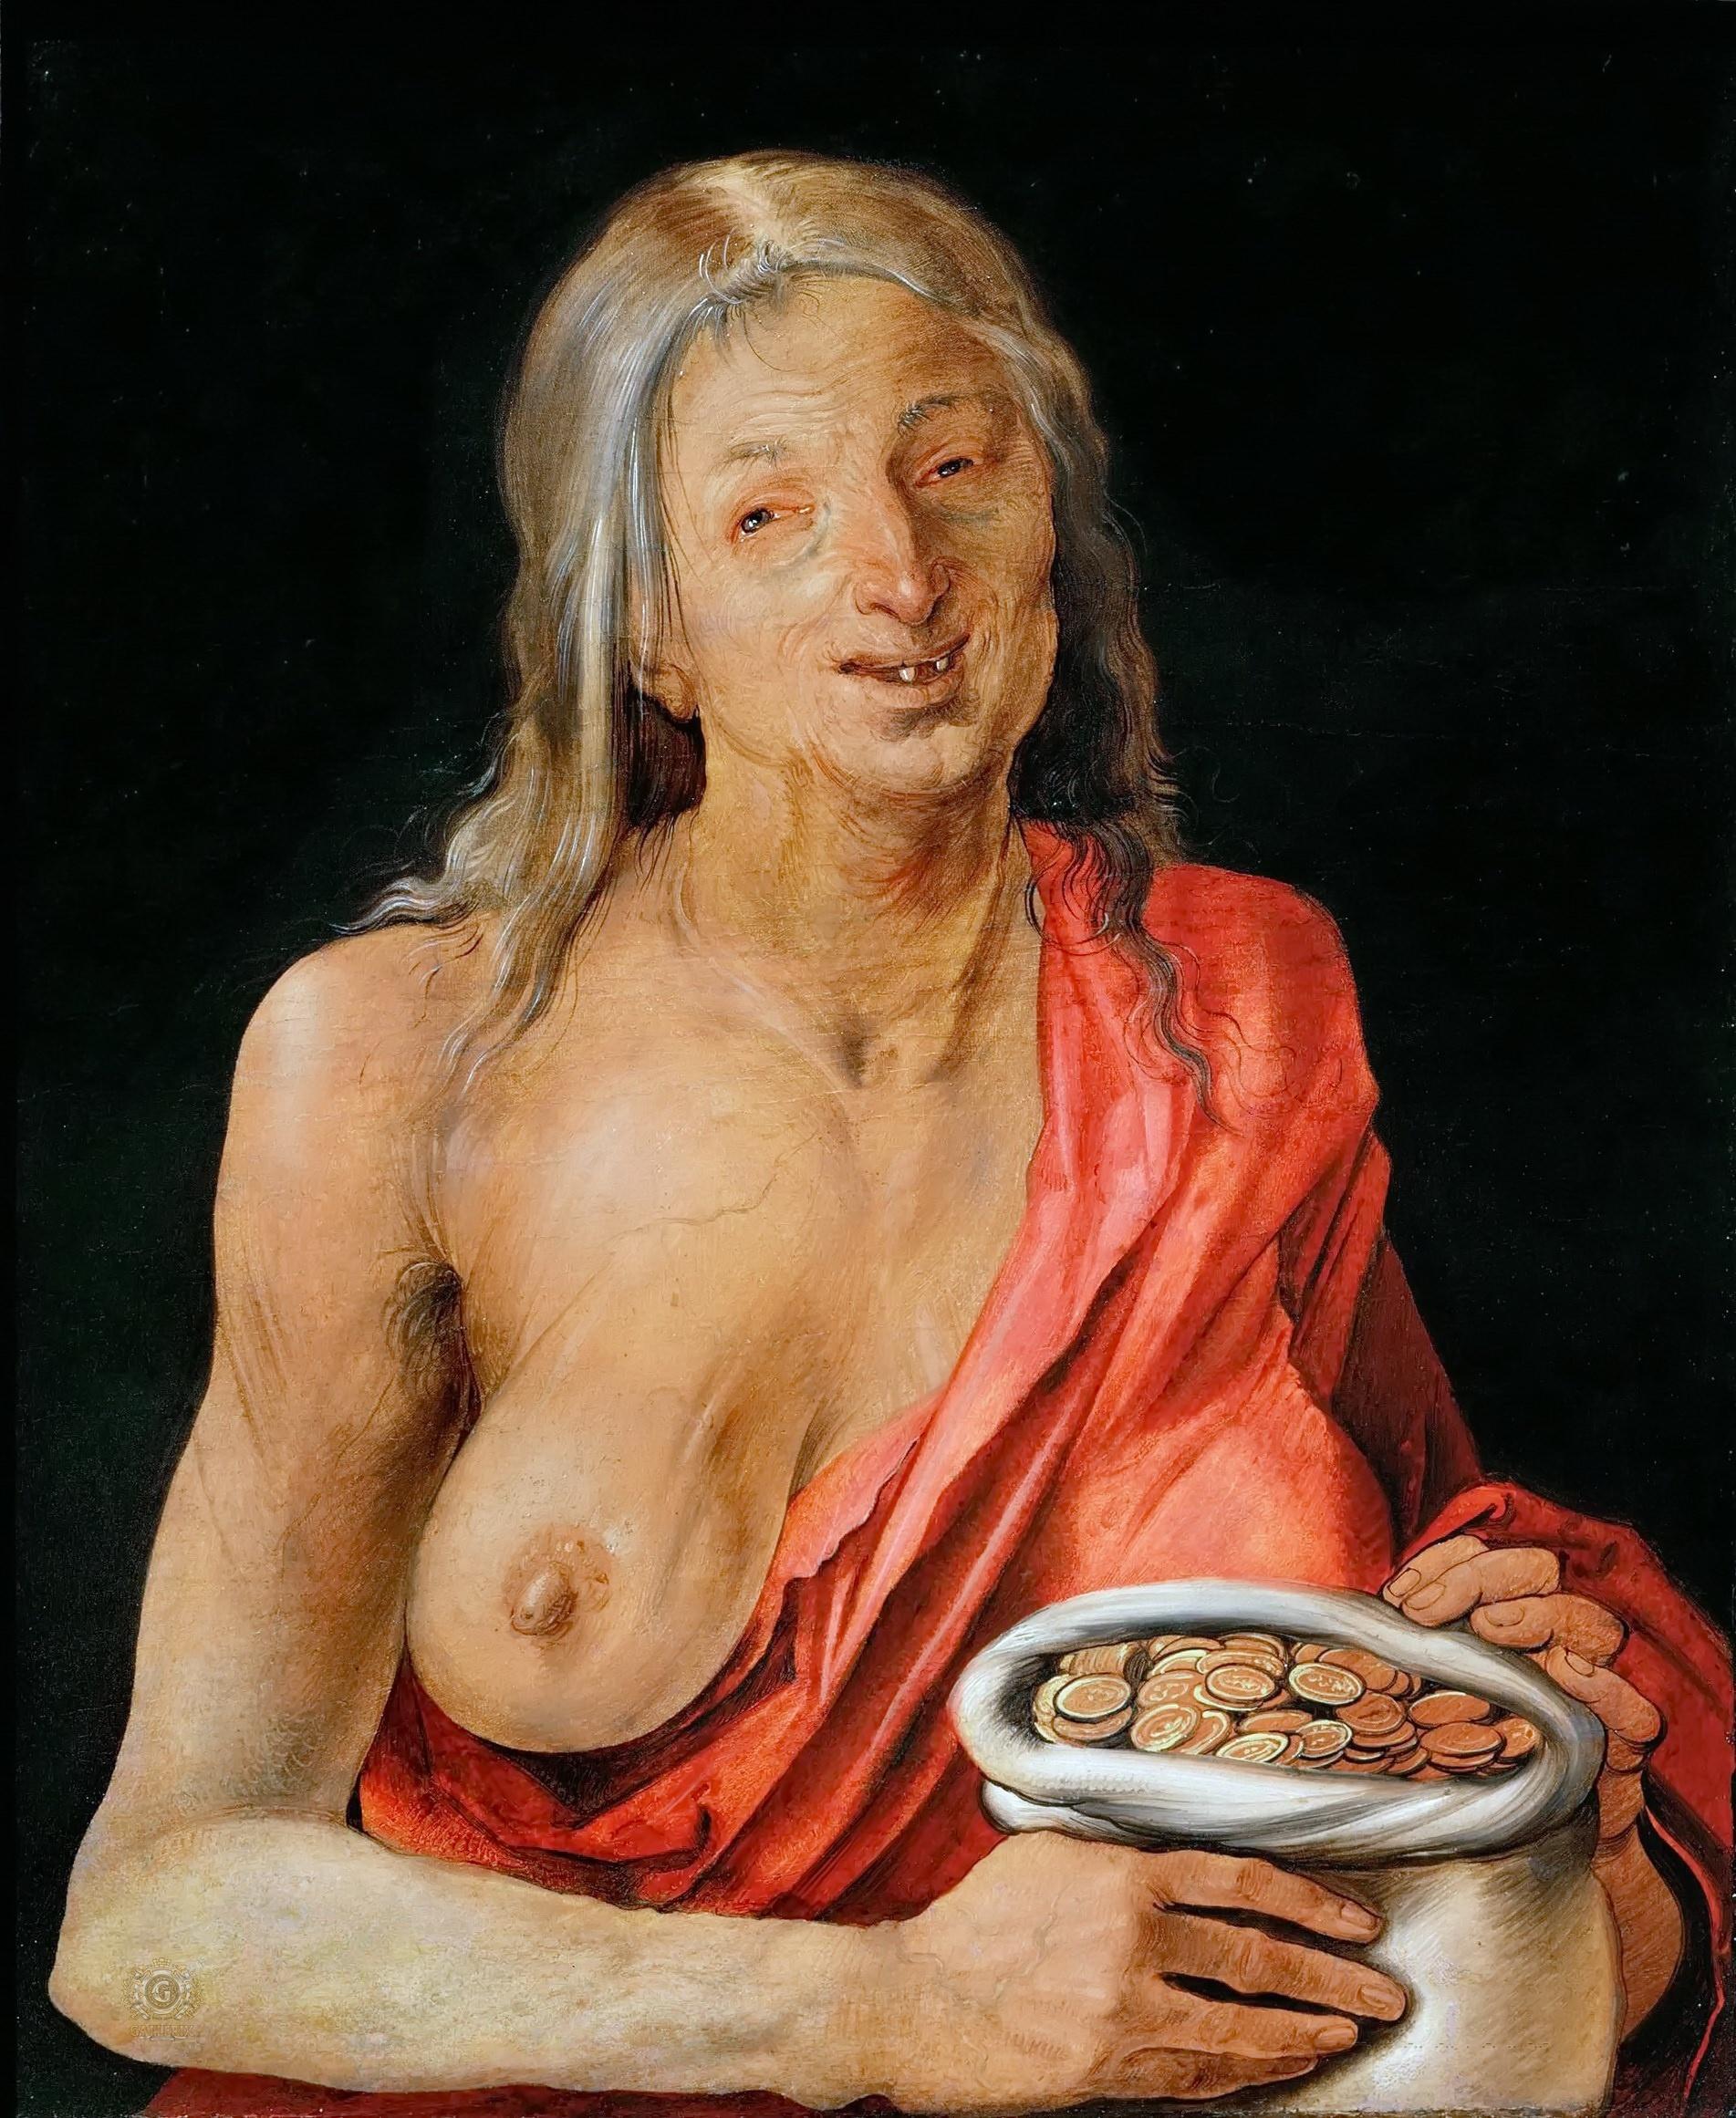 Durer 1507 Vanitas, Kunsthistorischesmuseum Vienne